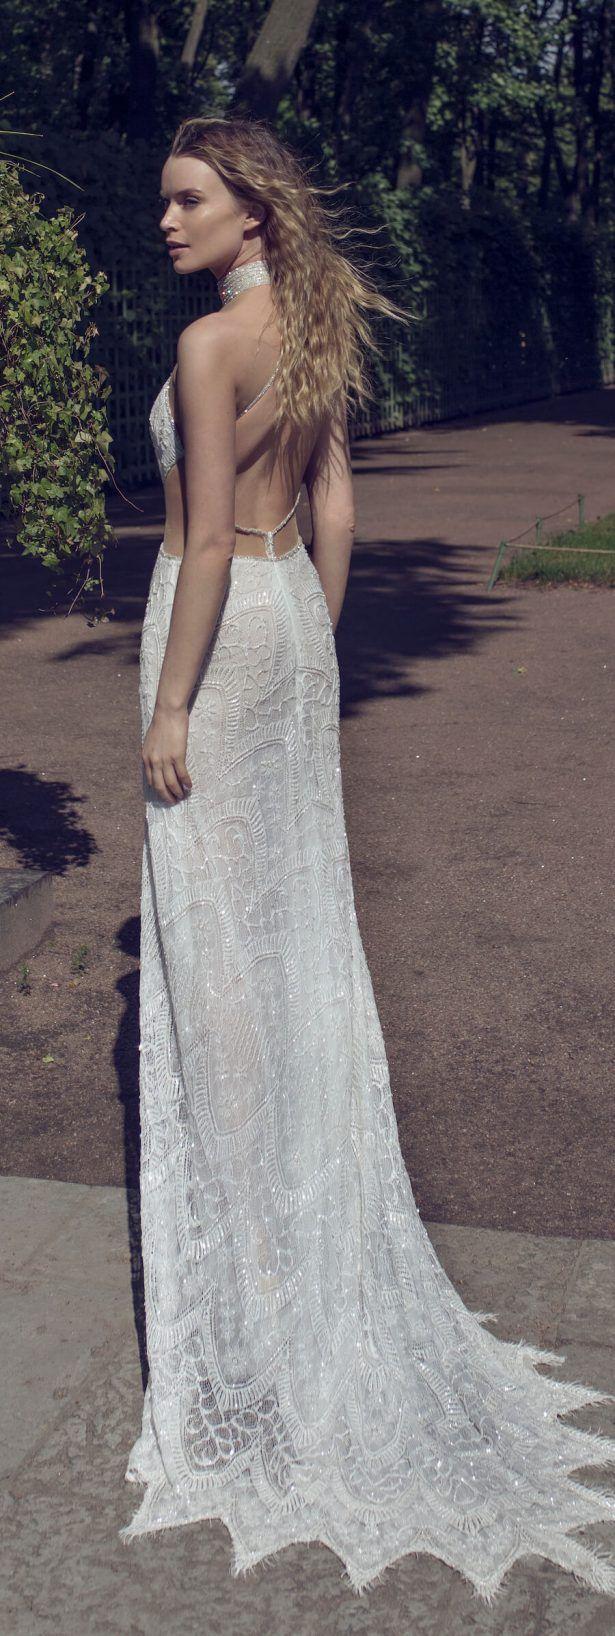 Lian Rokman Wedding Dresses 2018: Stardust Bridal Collection ...